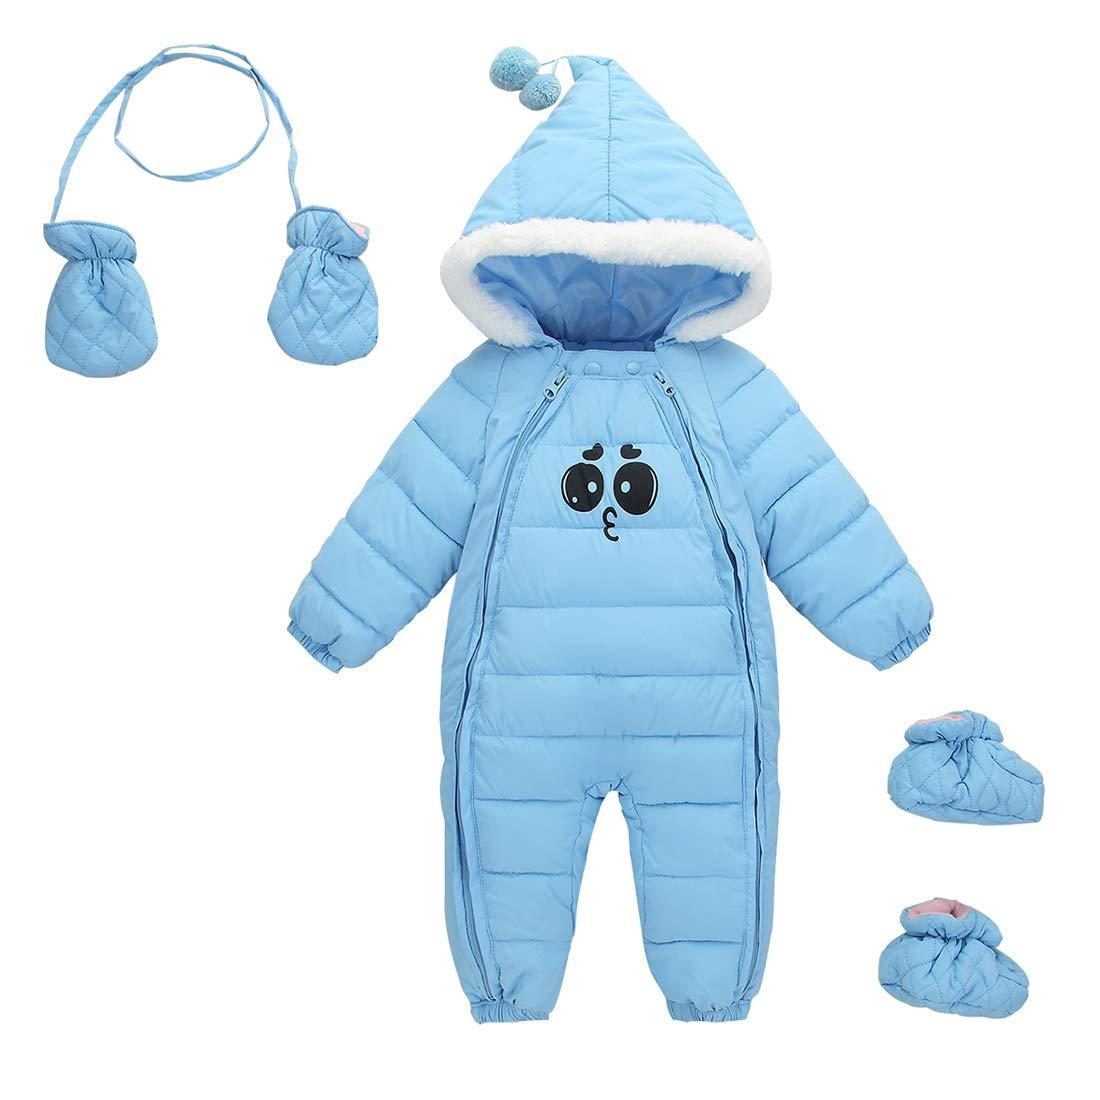 Aivtalk Toddler Baby Boys Winter Jumpsuit Zipped Hood Snowsuit One Piece Warm Solid Bodysuit Clothes For 24-30 Months Light Blue by Aivtalk